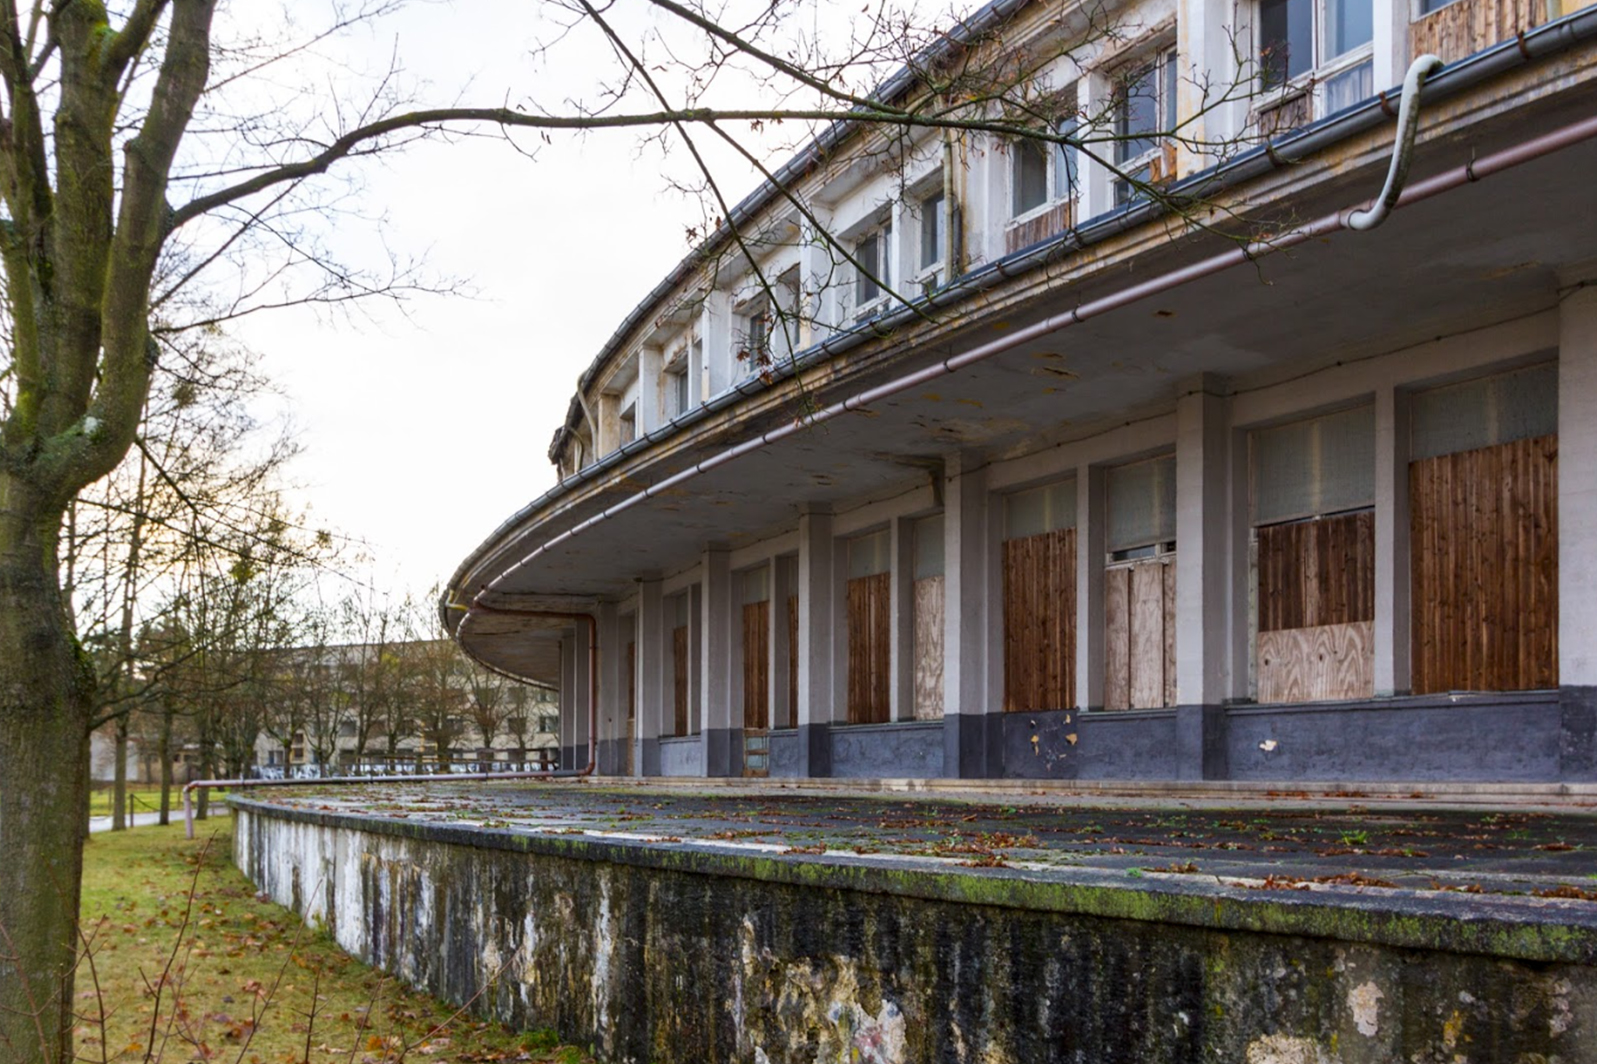 urbex berlin 1936 abandon village - Berlin, Sarajevo, Athènes : les sites des Jeux Olympiques version urbex